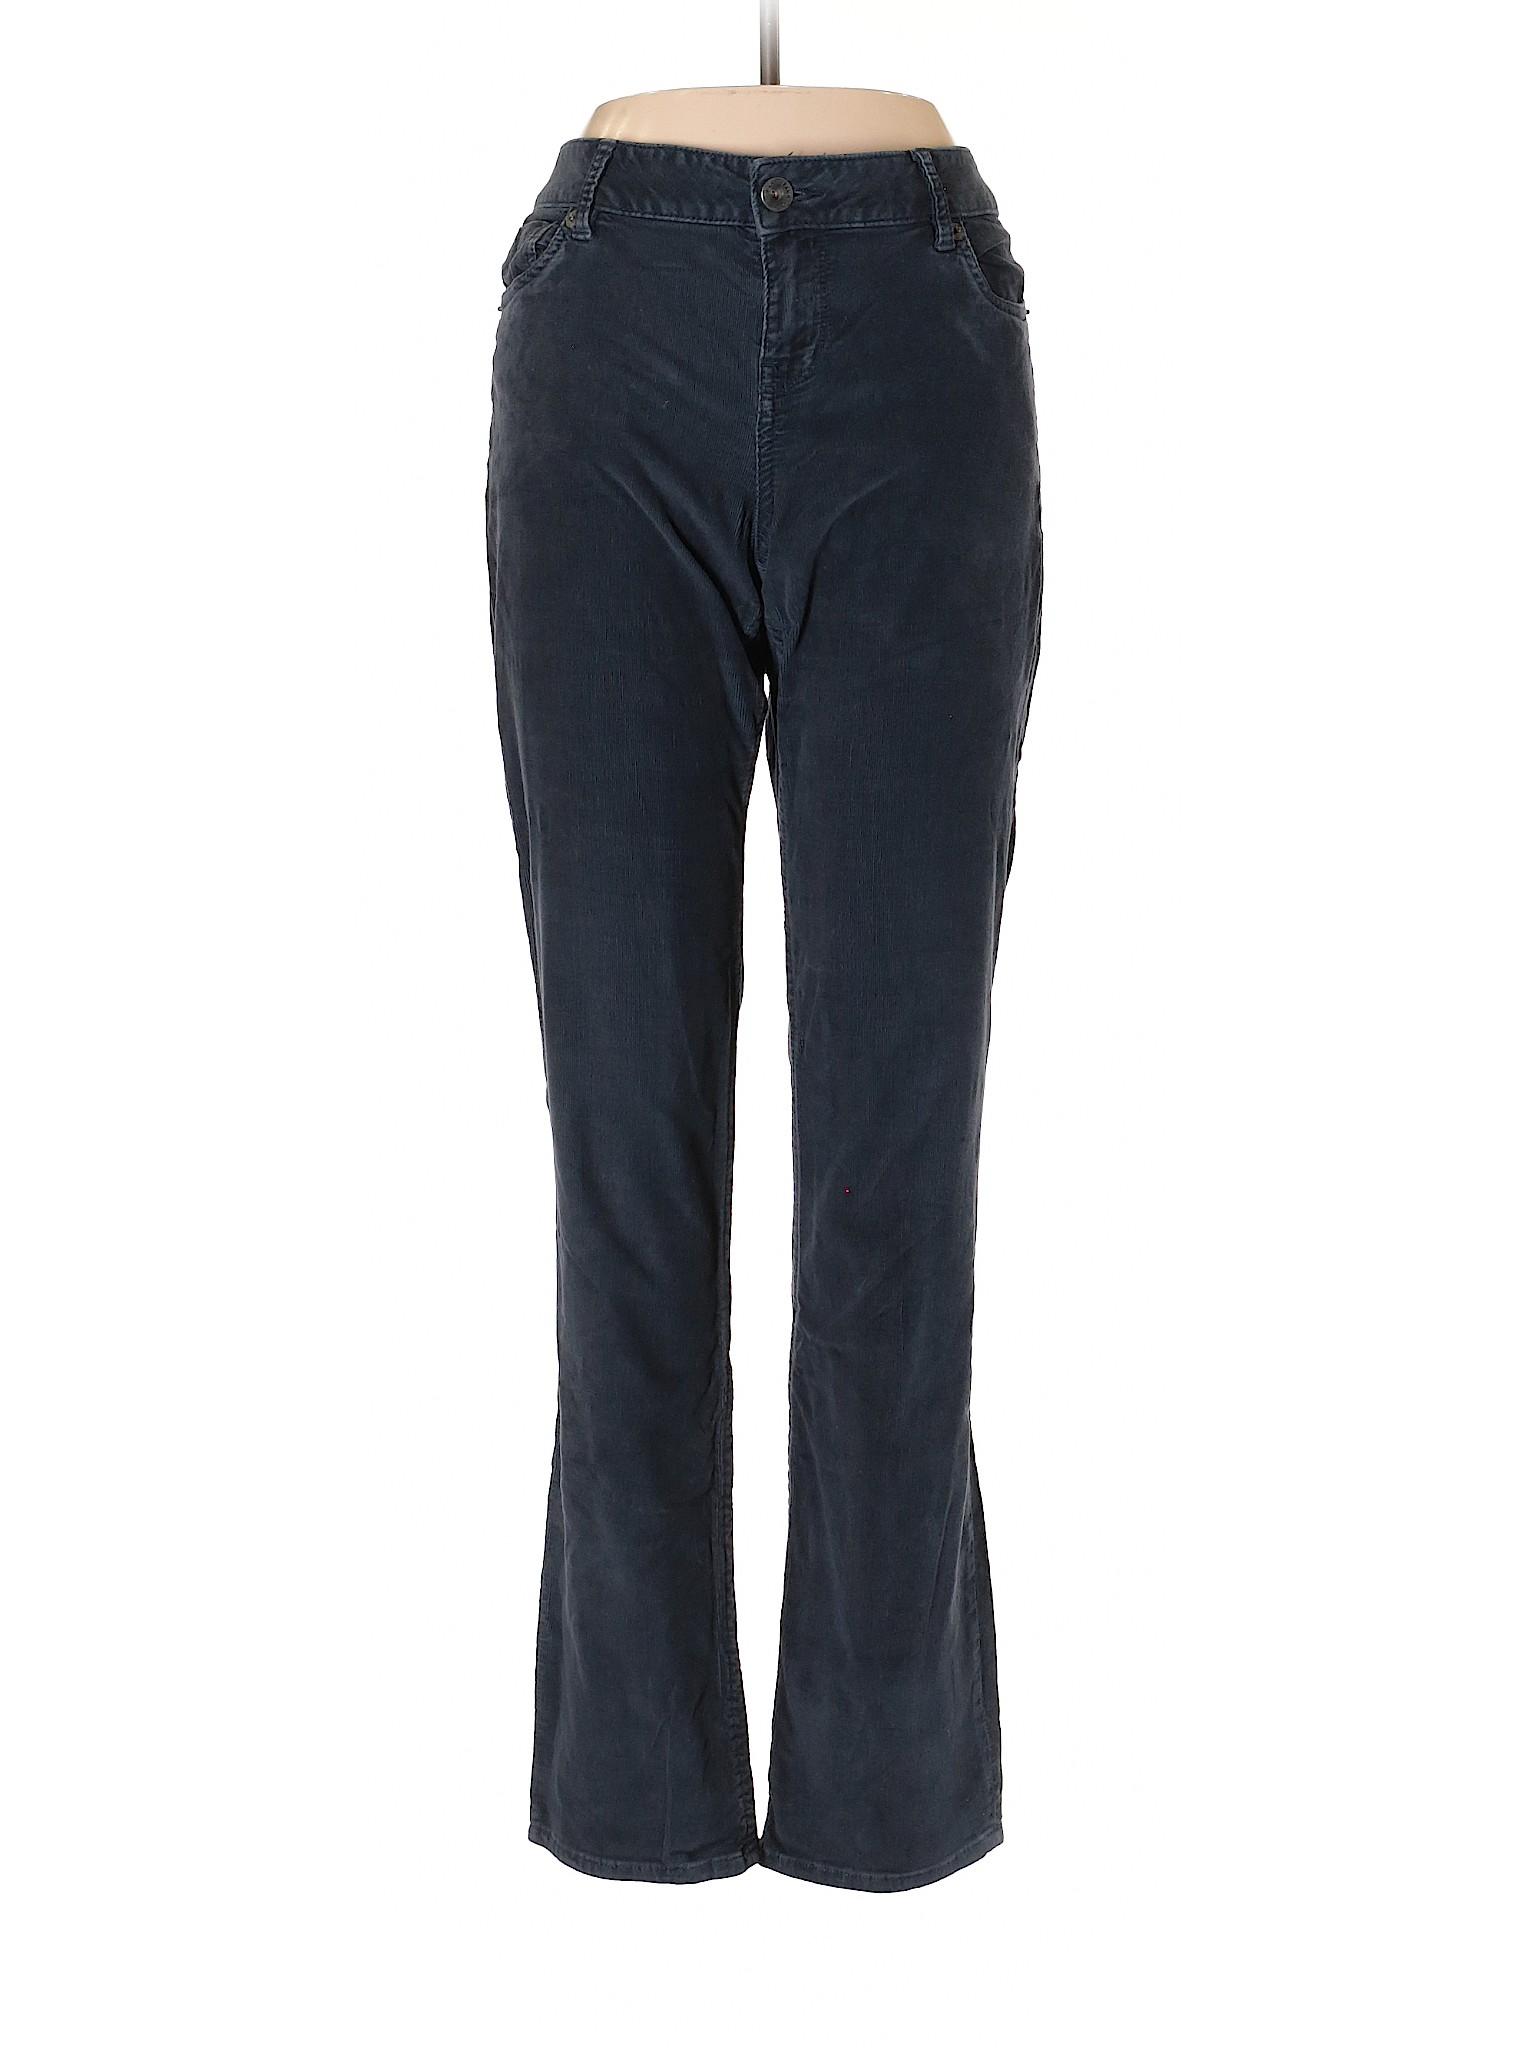 Jeans Cords Boutique Jeans winter Boutique winter DKNY DKNY Cords pCwqIB